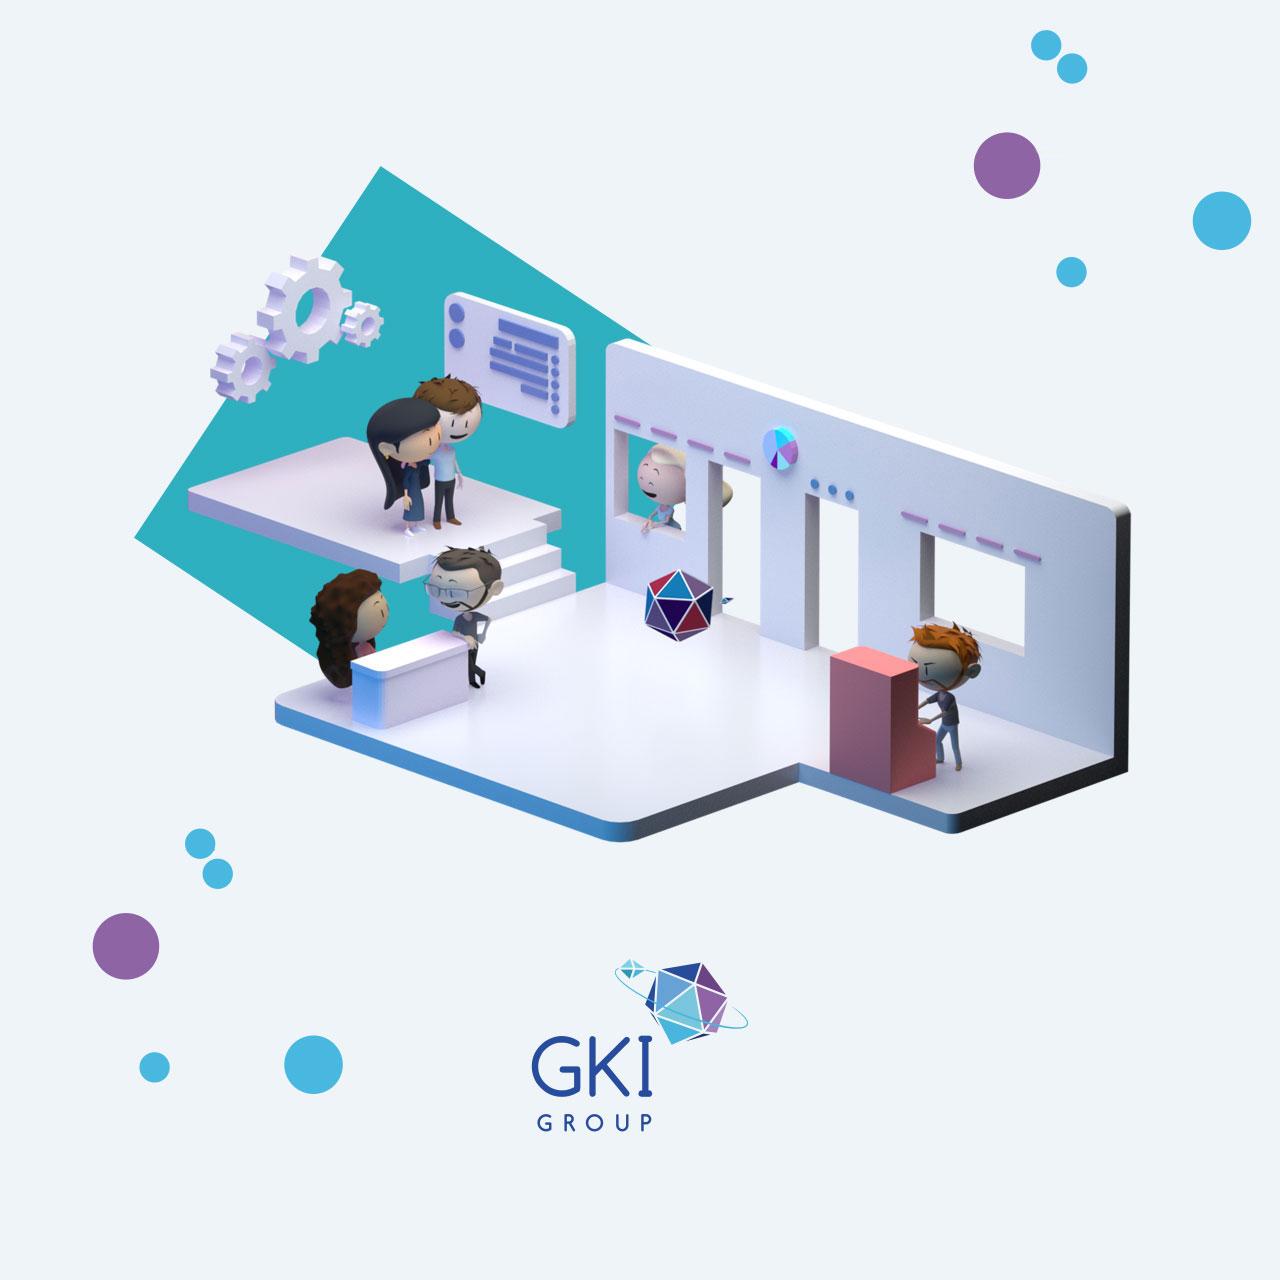 gki-featured-image1